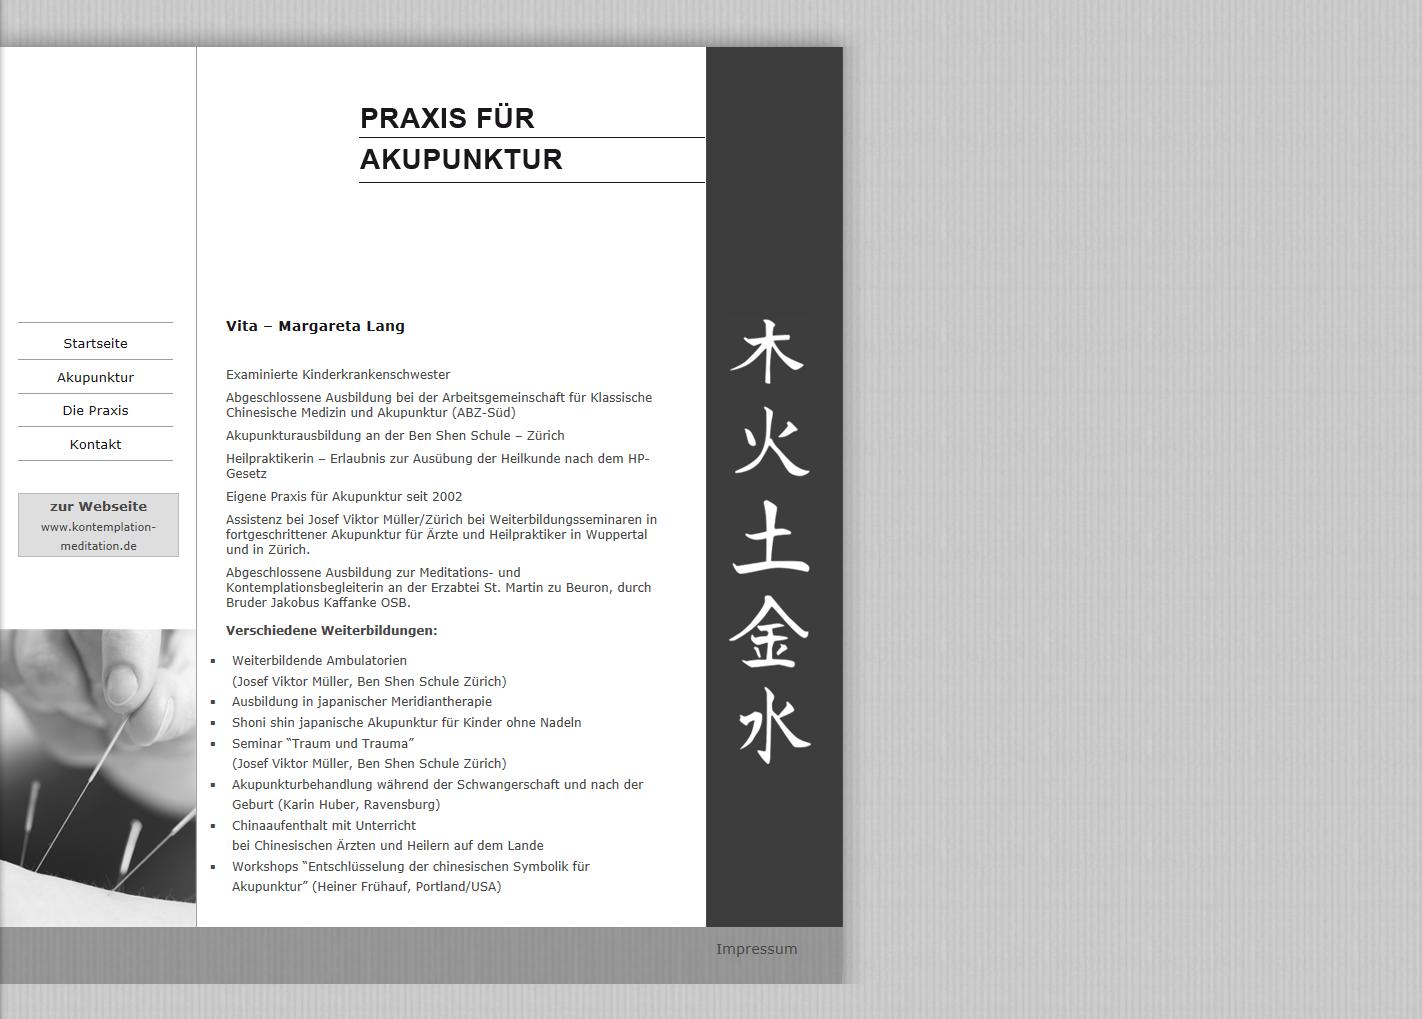 2011-01-18_Akupunkturpraxis-vs